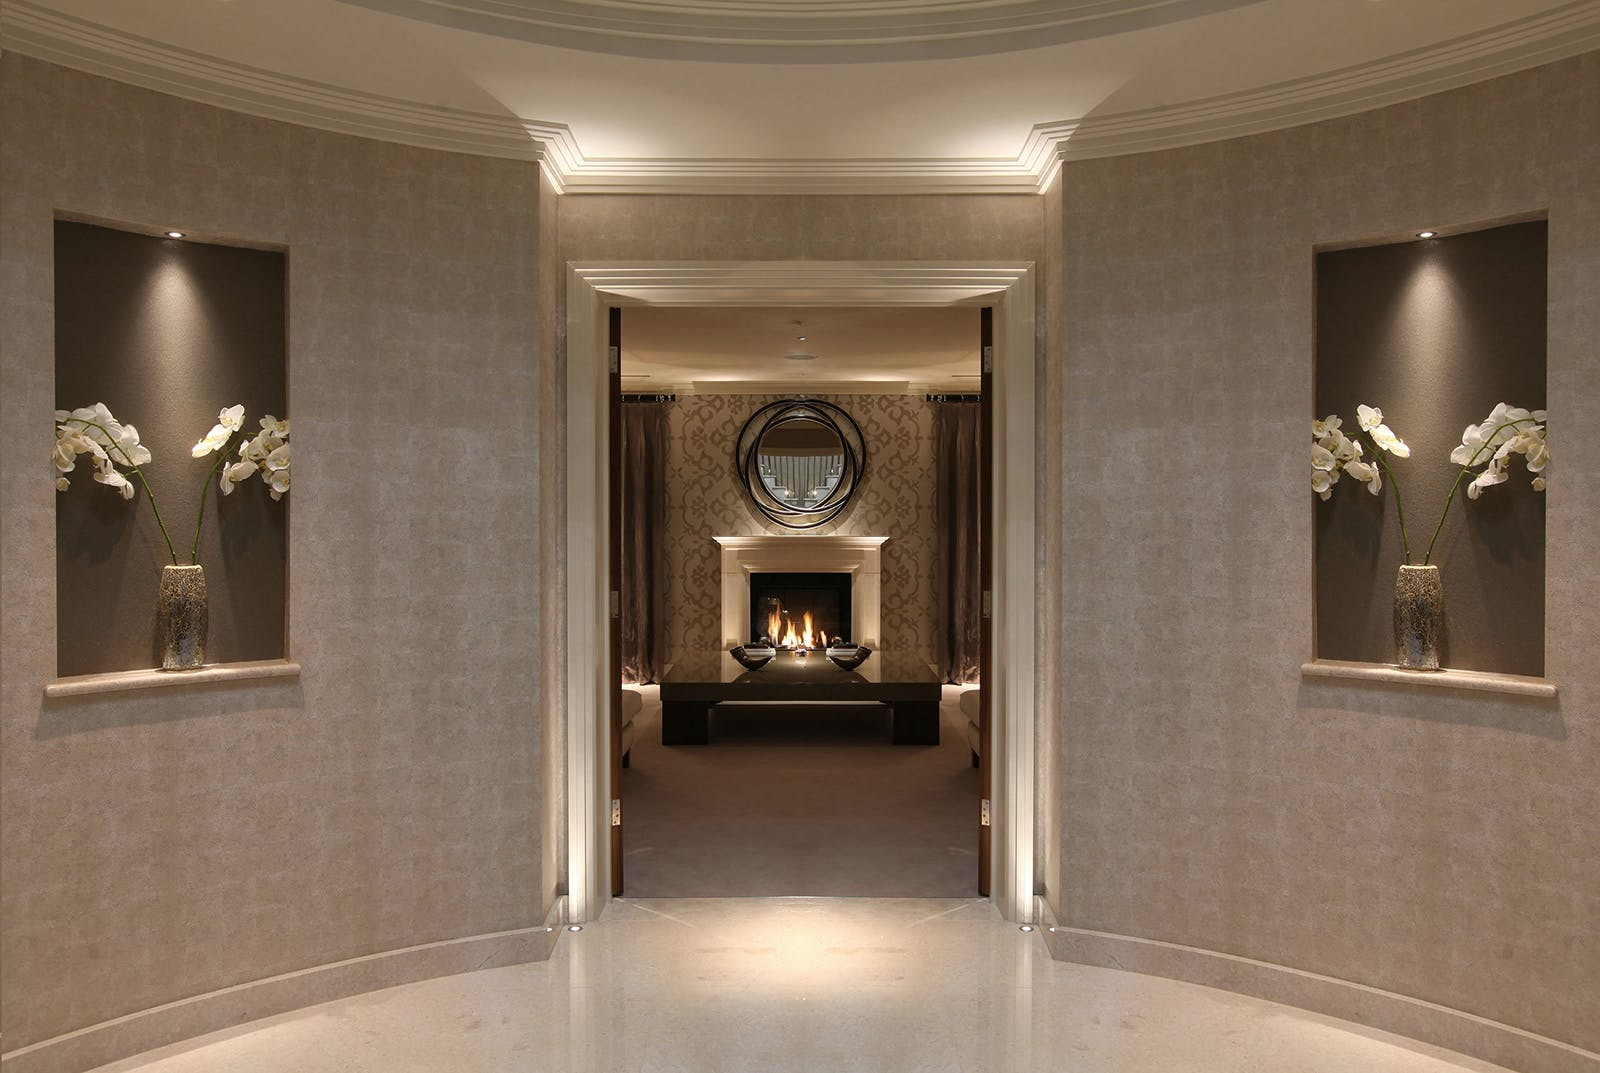 layered lighting entrance to room